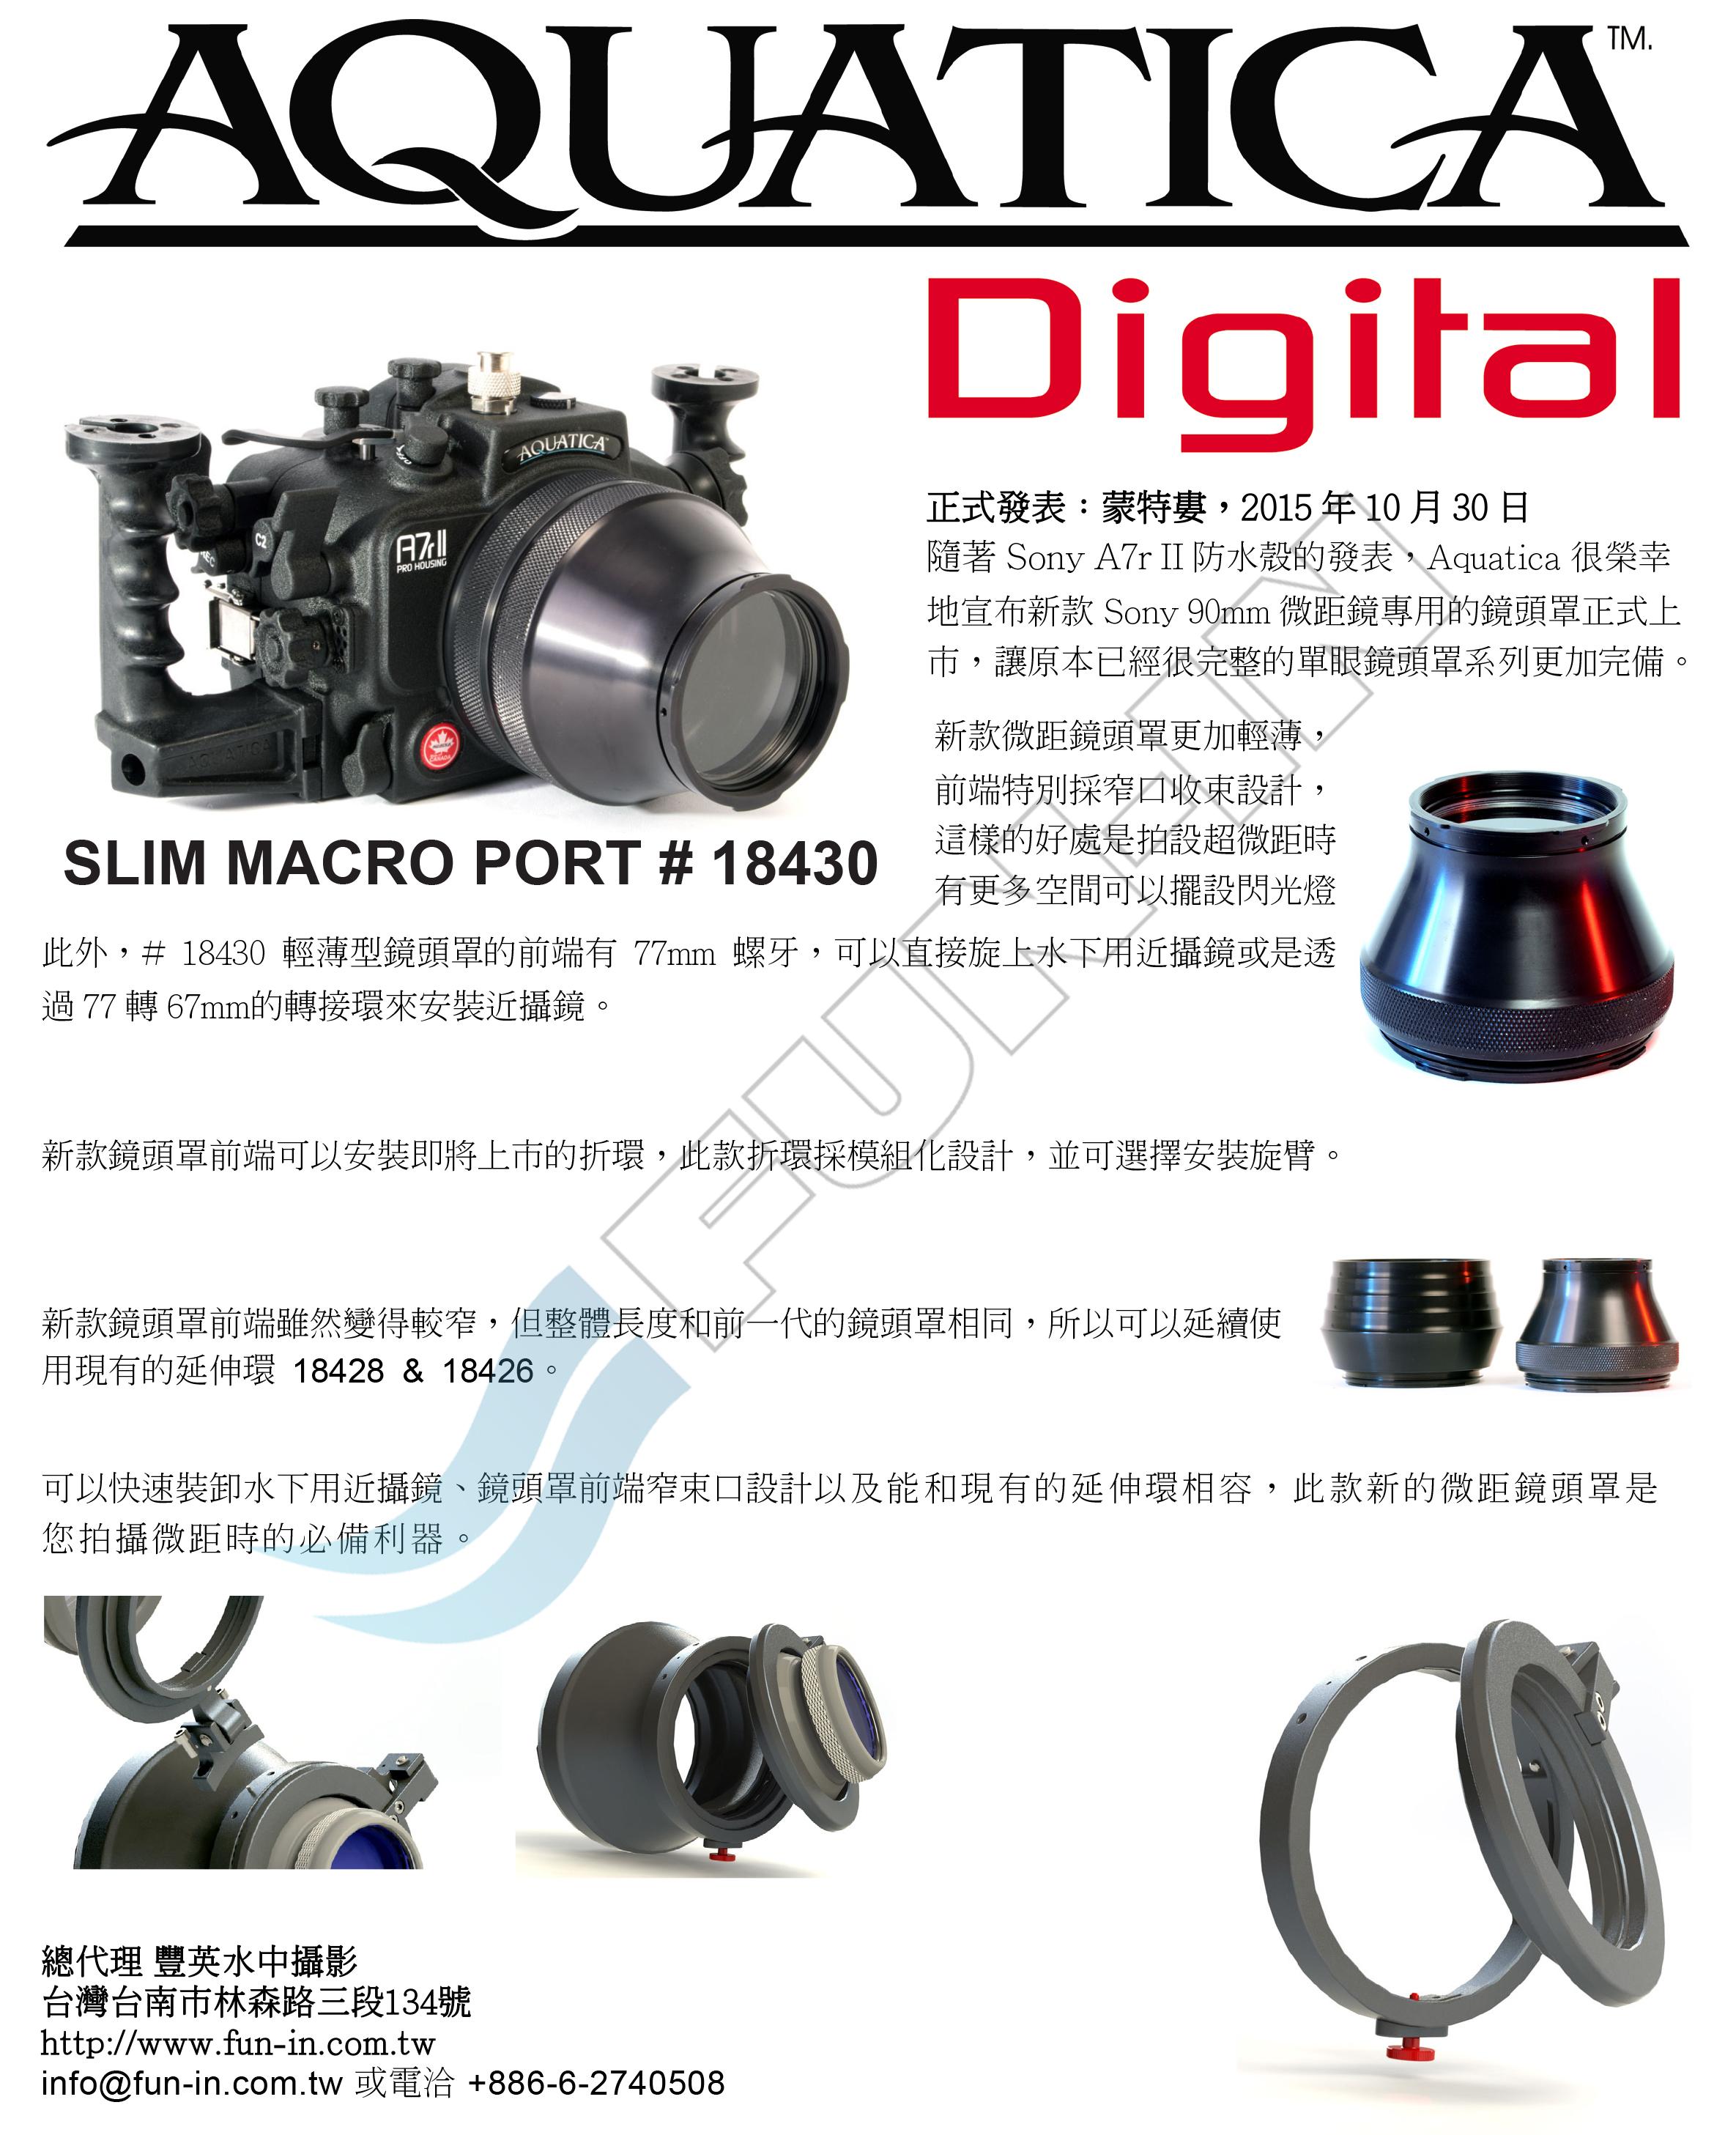 Press release_18430 Slim Macro Port_Cht